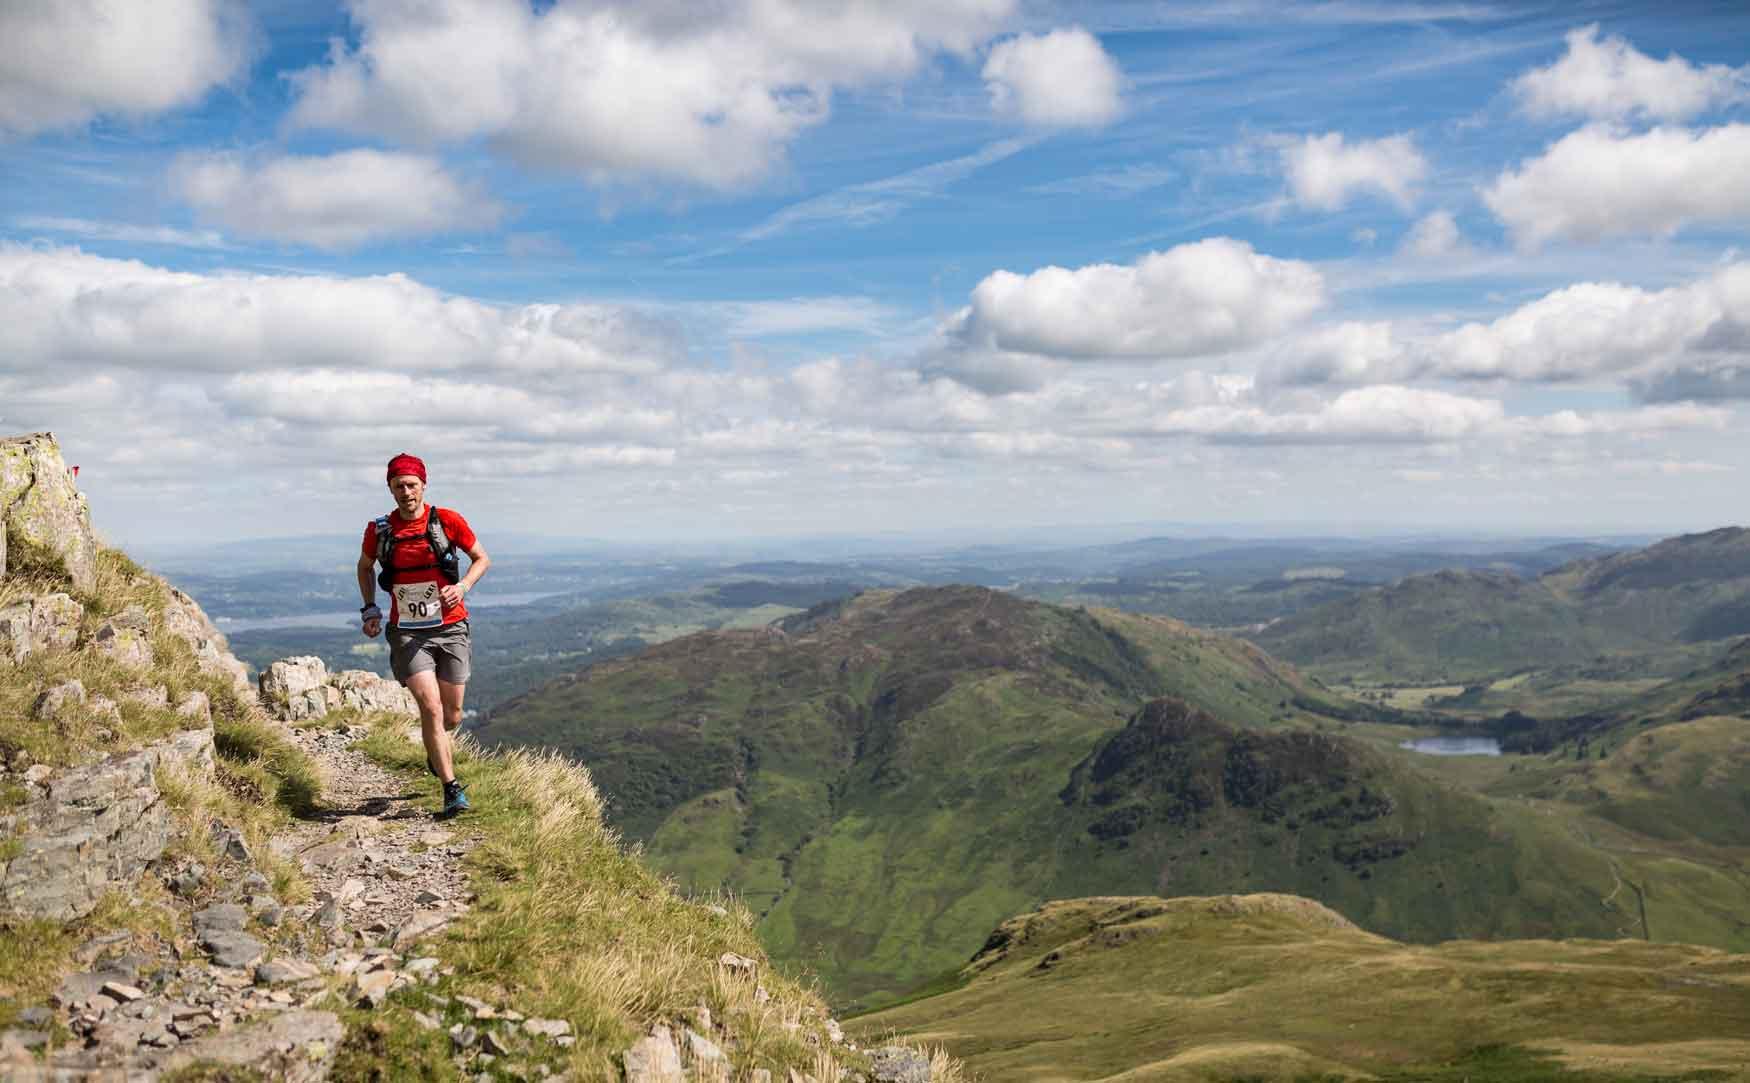 Ultramarathon nutrition - what does an elite ultramarathon runner eat?